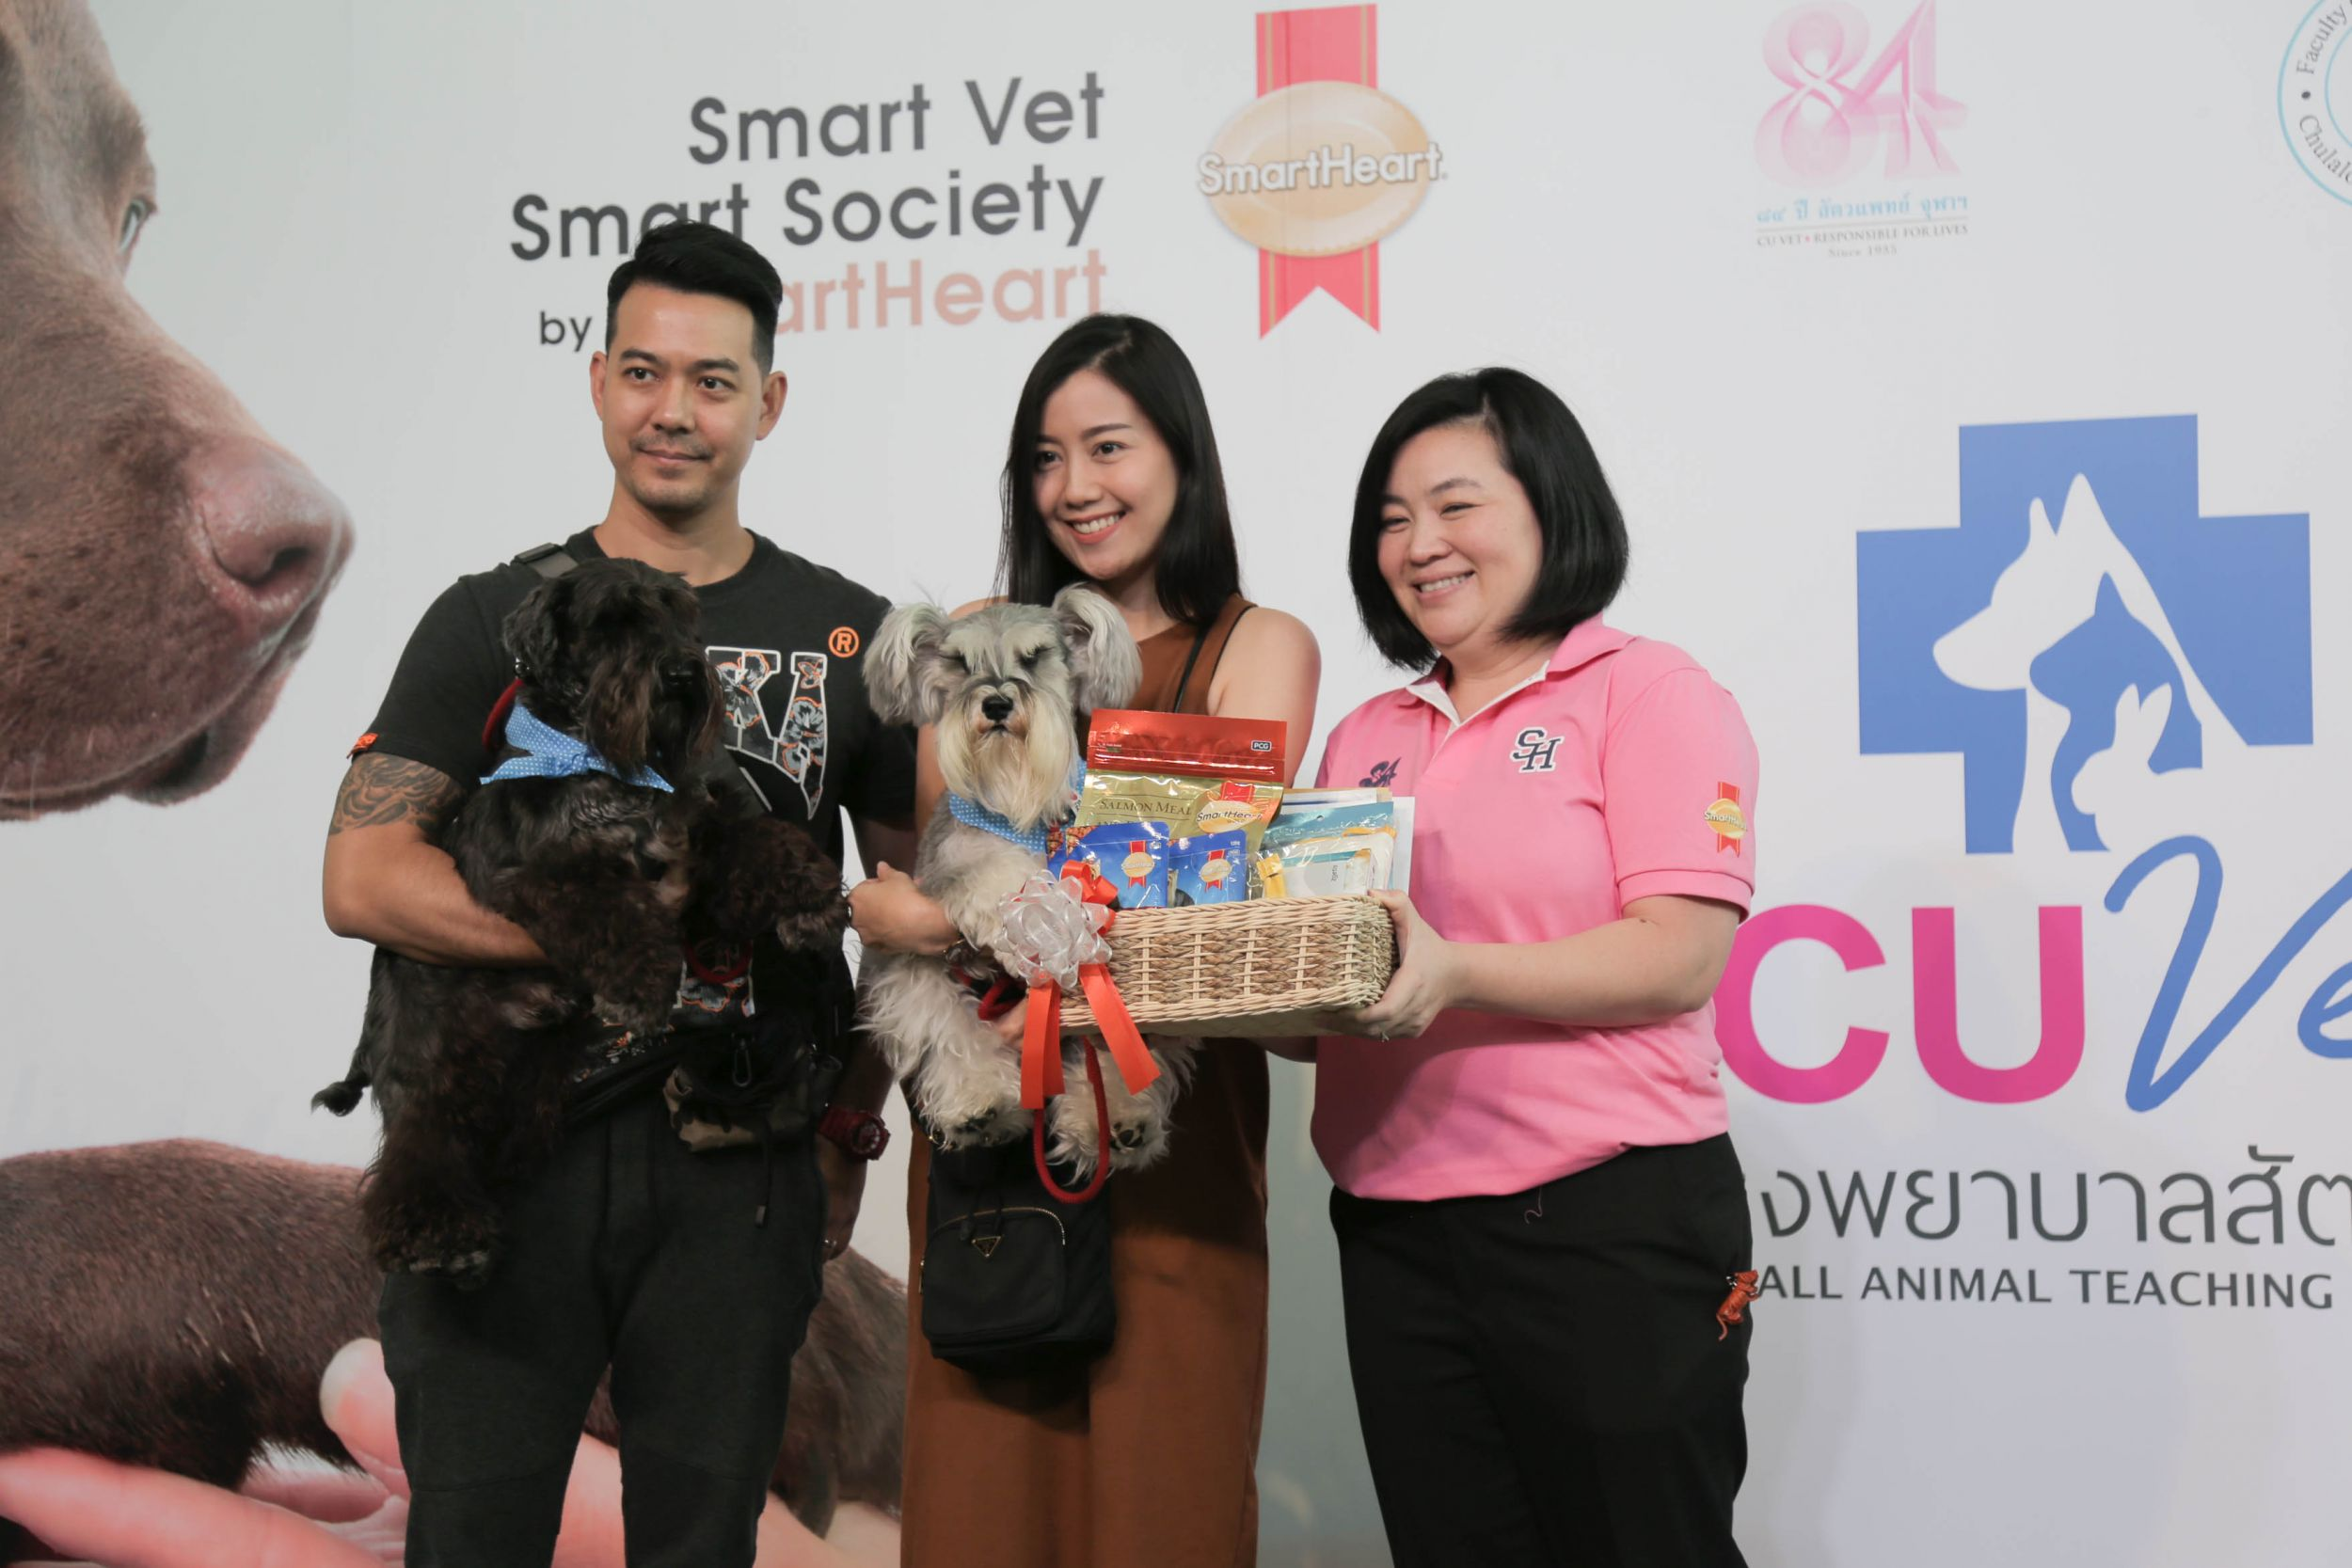 Dogilike.com :: ภาพบรรยากาศงาน Smart Vet , Smart Society ในโอกาสรอบ84ปี คณะสัตวแพทยศาสตร์ จุฬาฯ